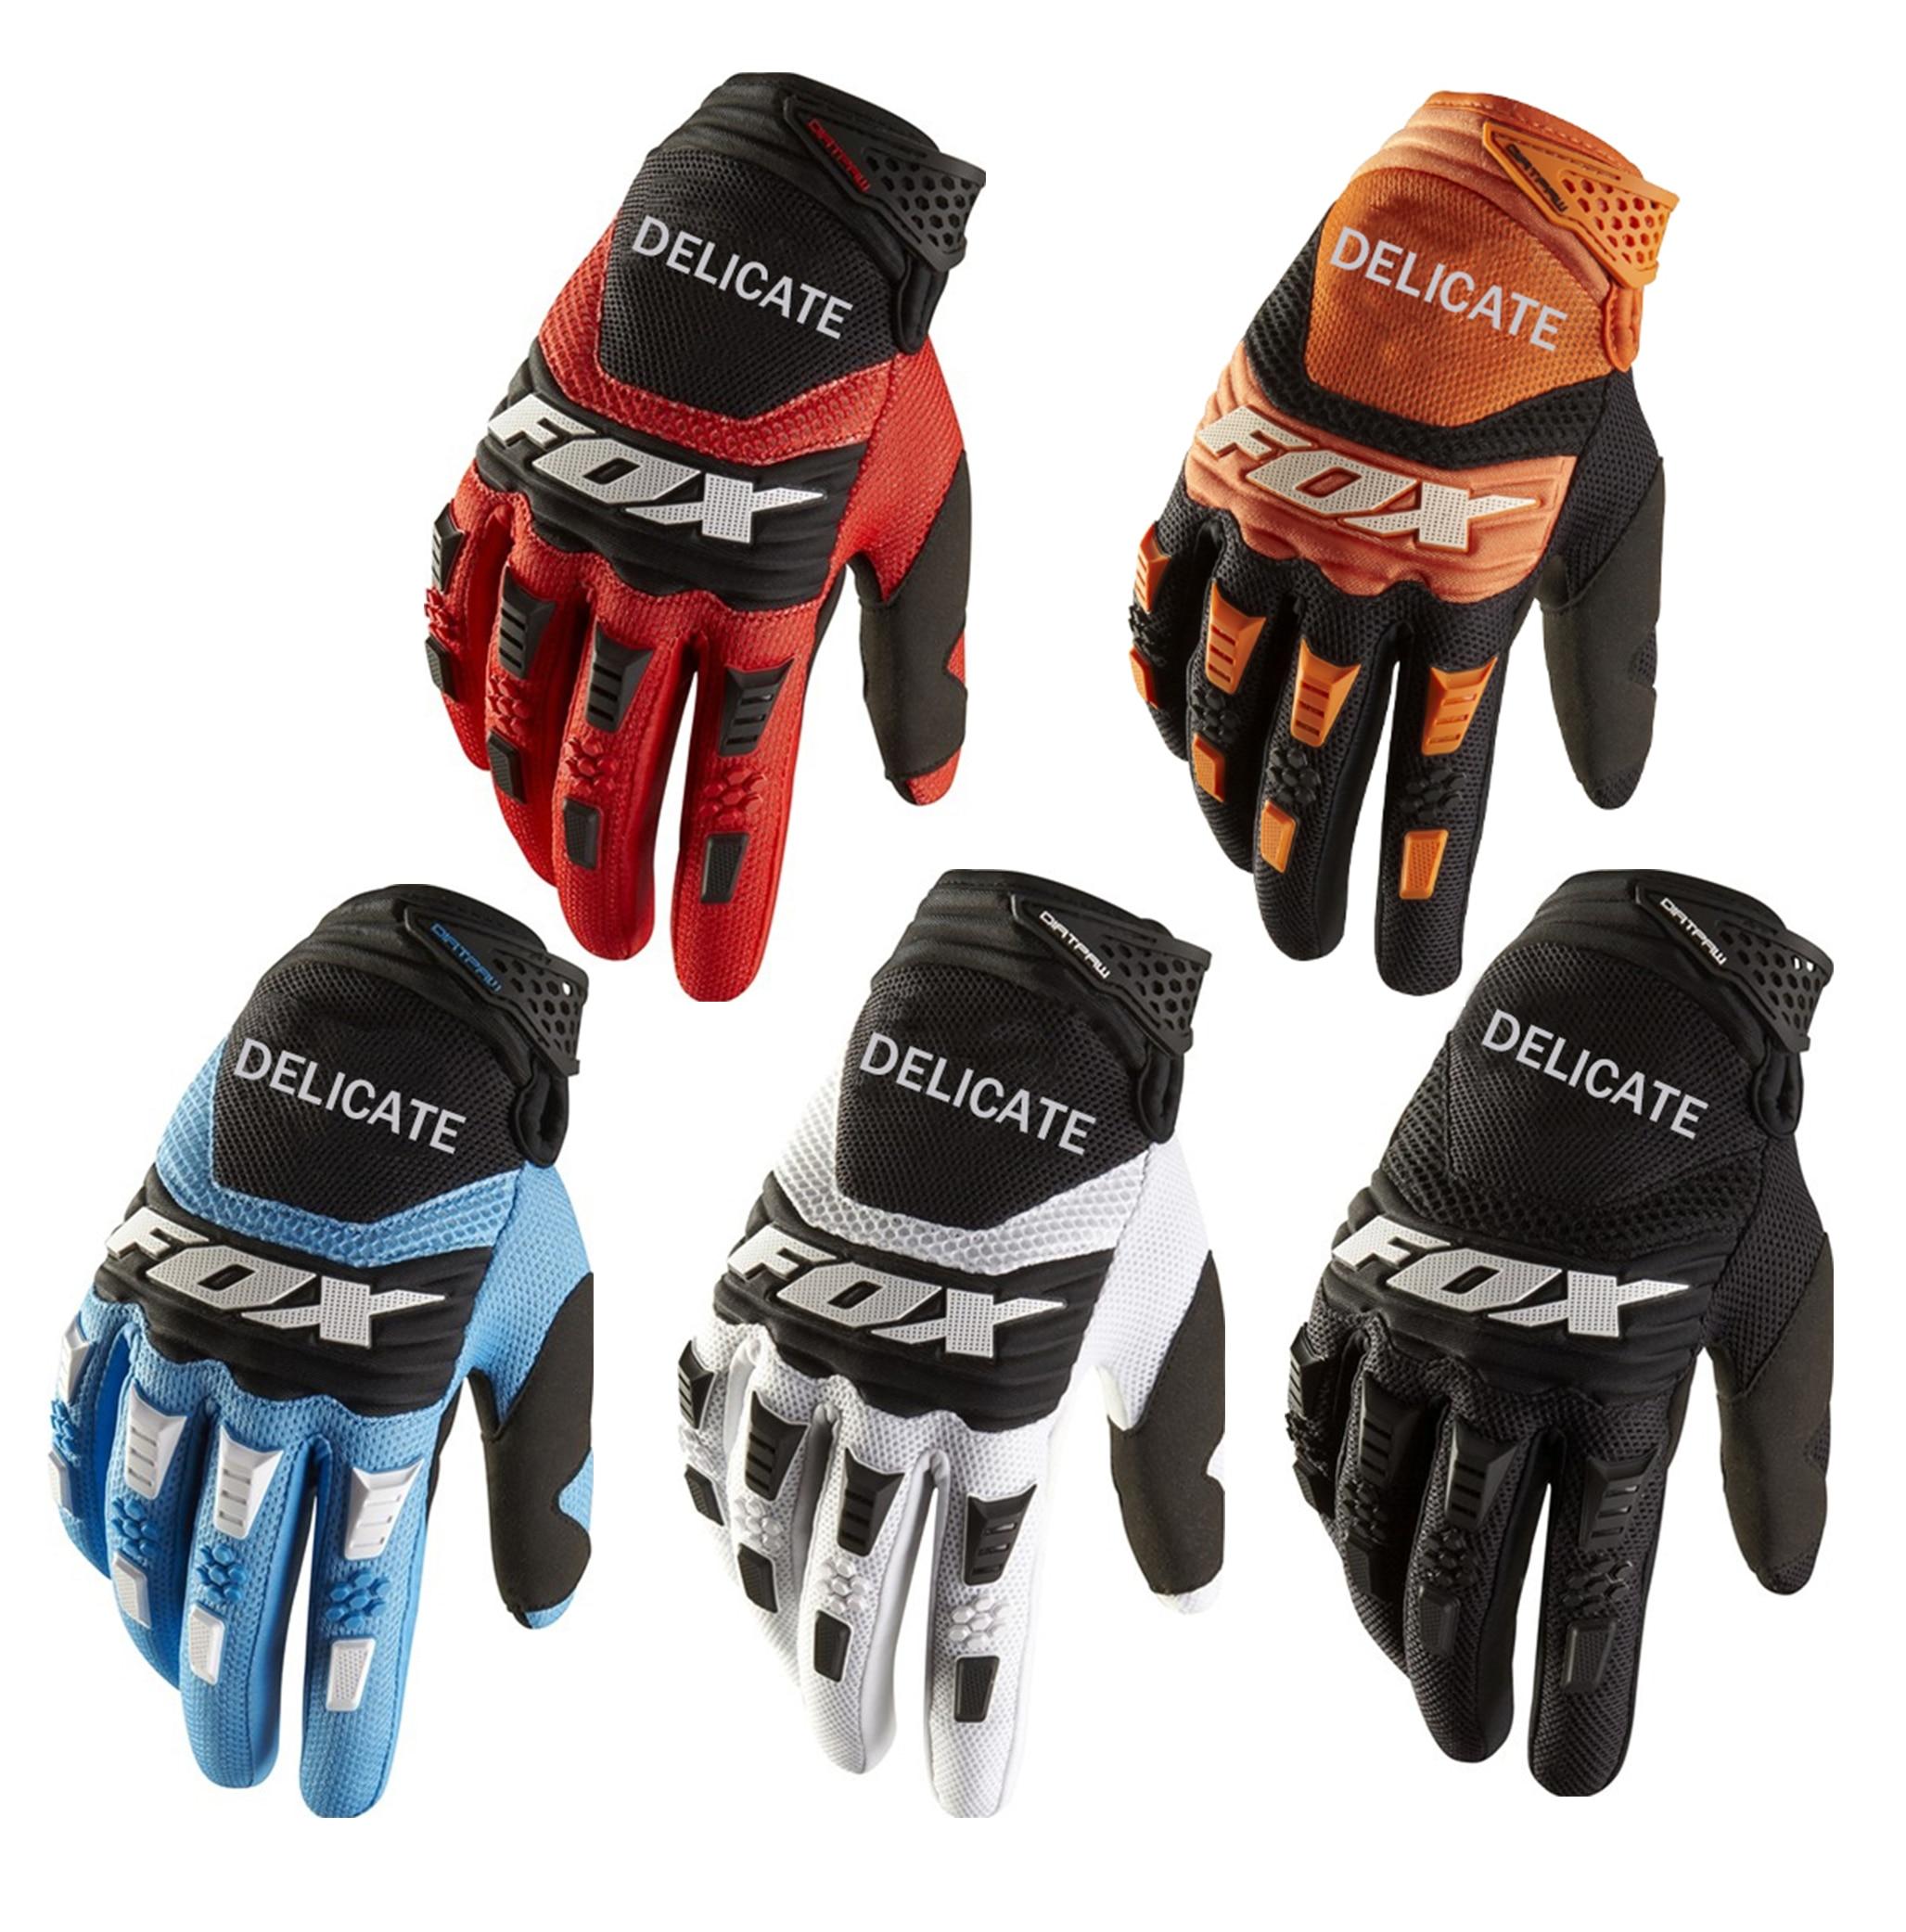 Delicate Fox MX Pawtector Gloves Cylcing Motor Motorcycle Motocross Dirt Bike MTB DH Race Gloves